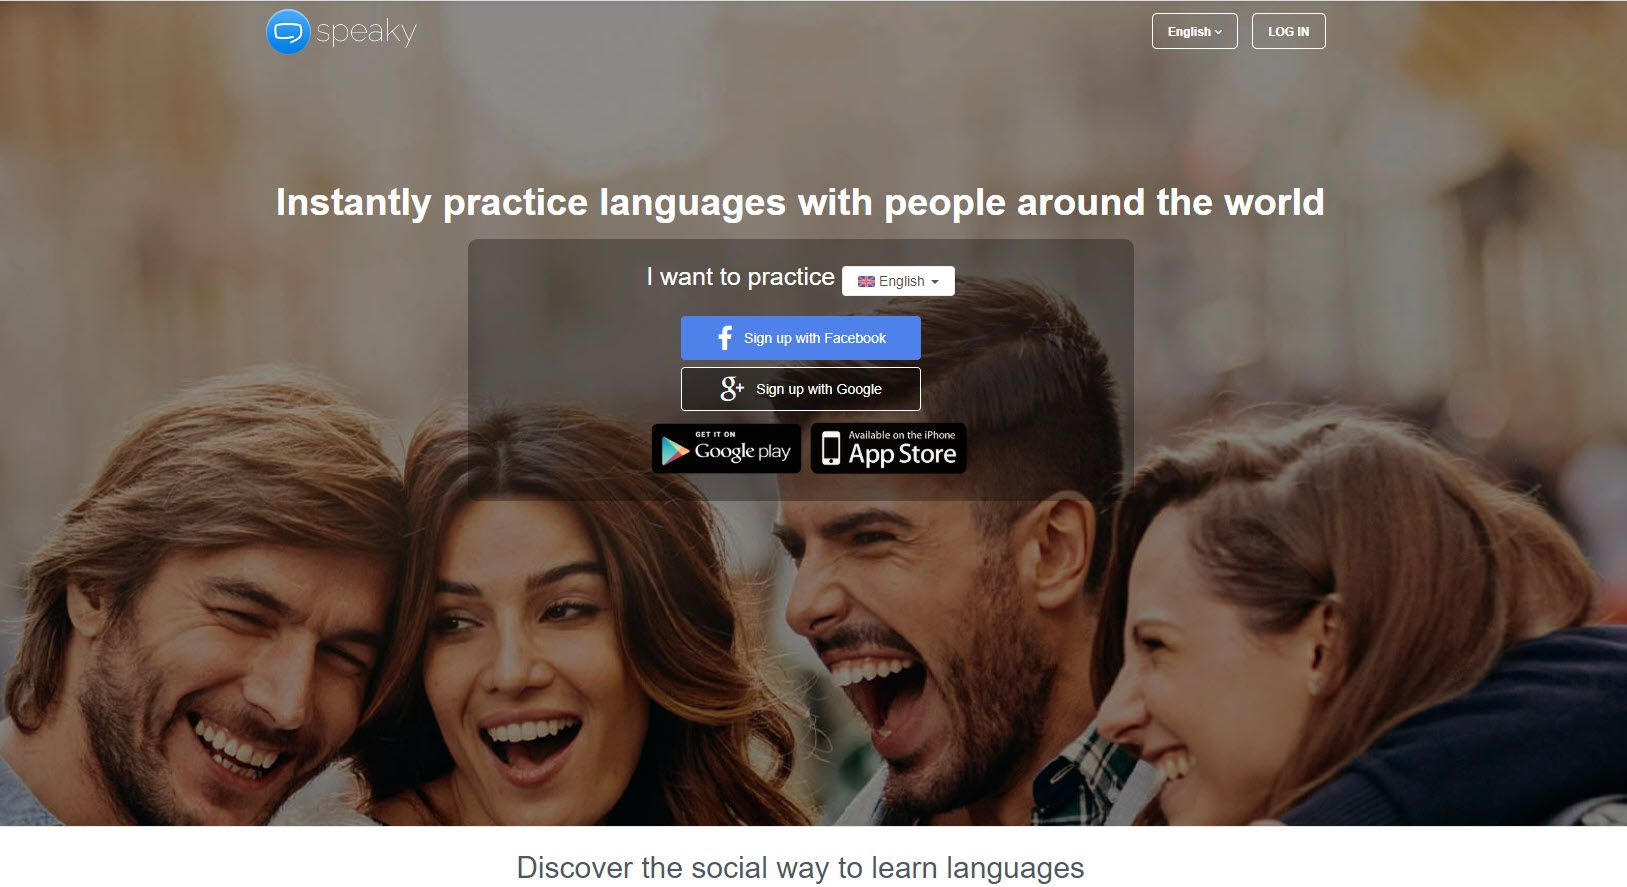 Screenshot of the Speaky website.